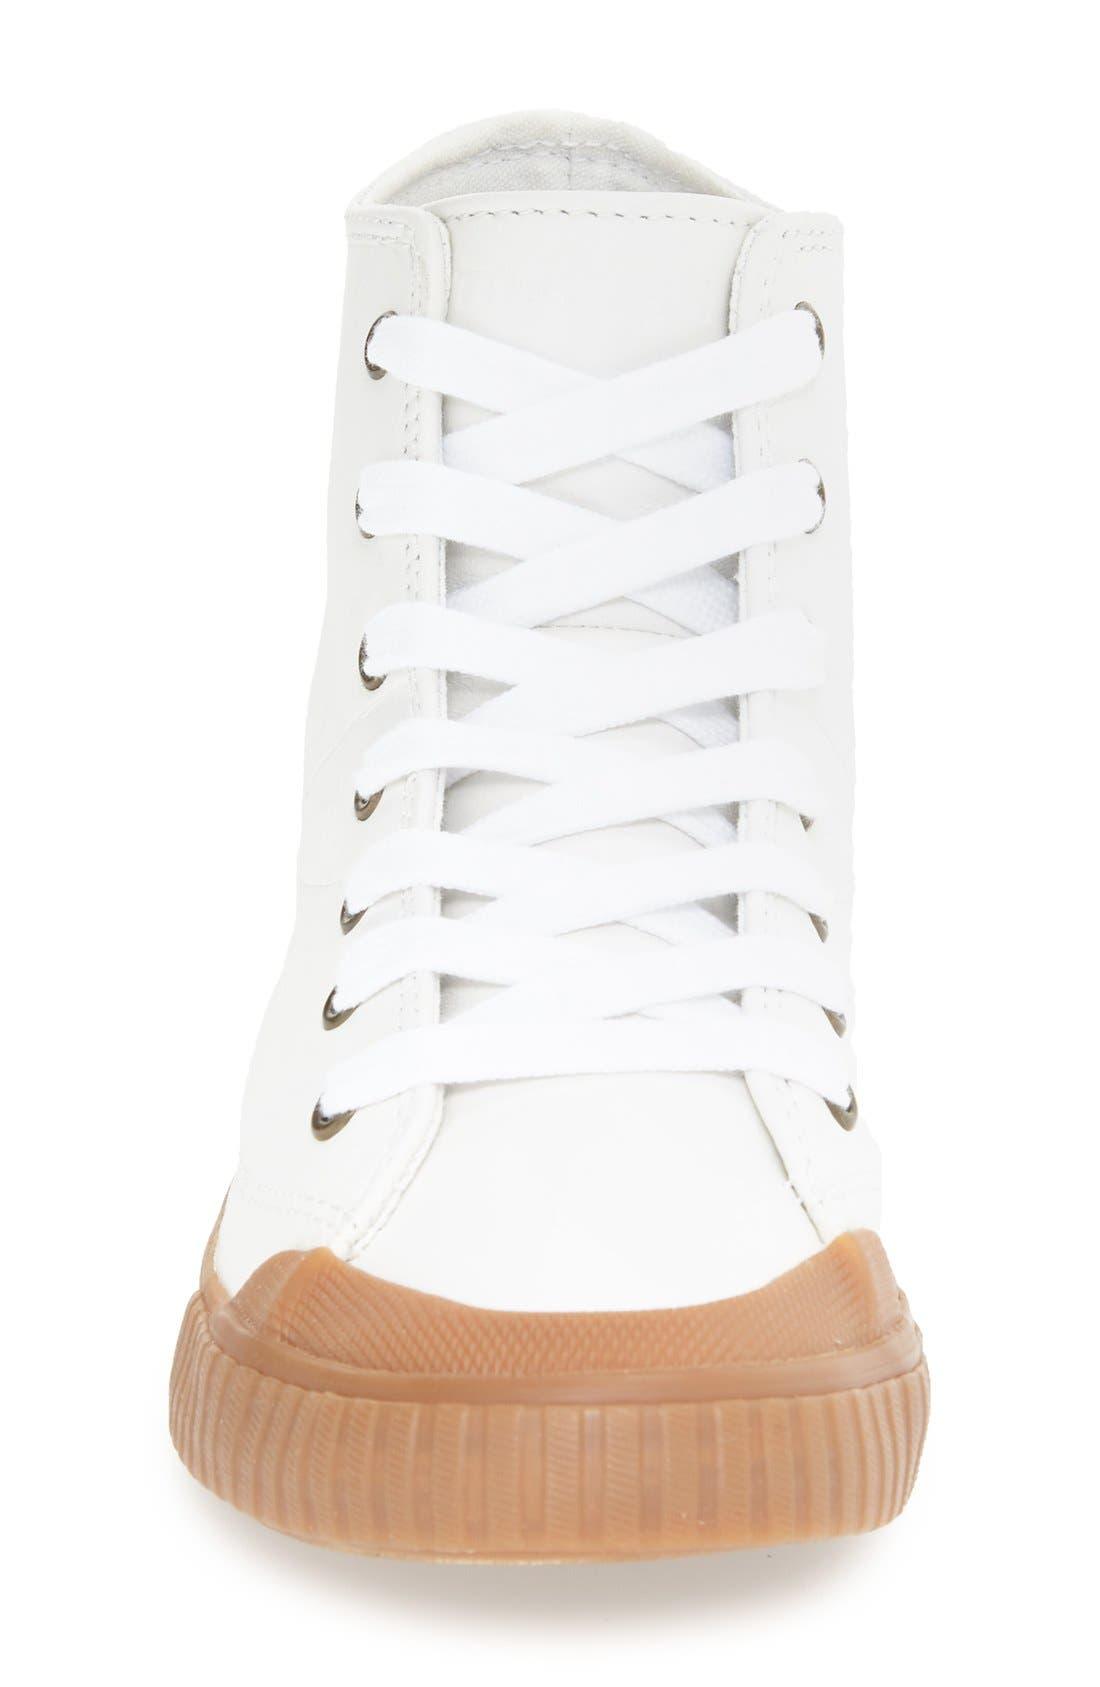 Marley 2 High Top Sneaker,                             Alternate thumbnail 17, color,